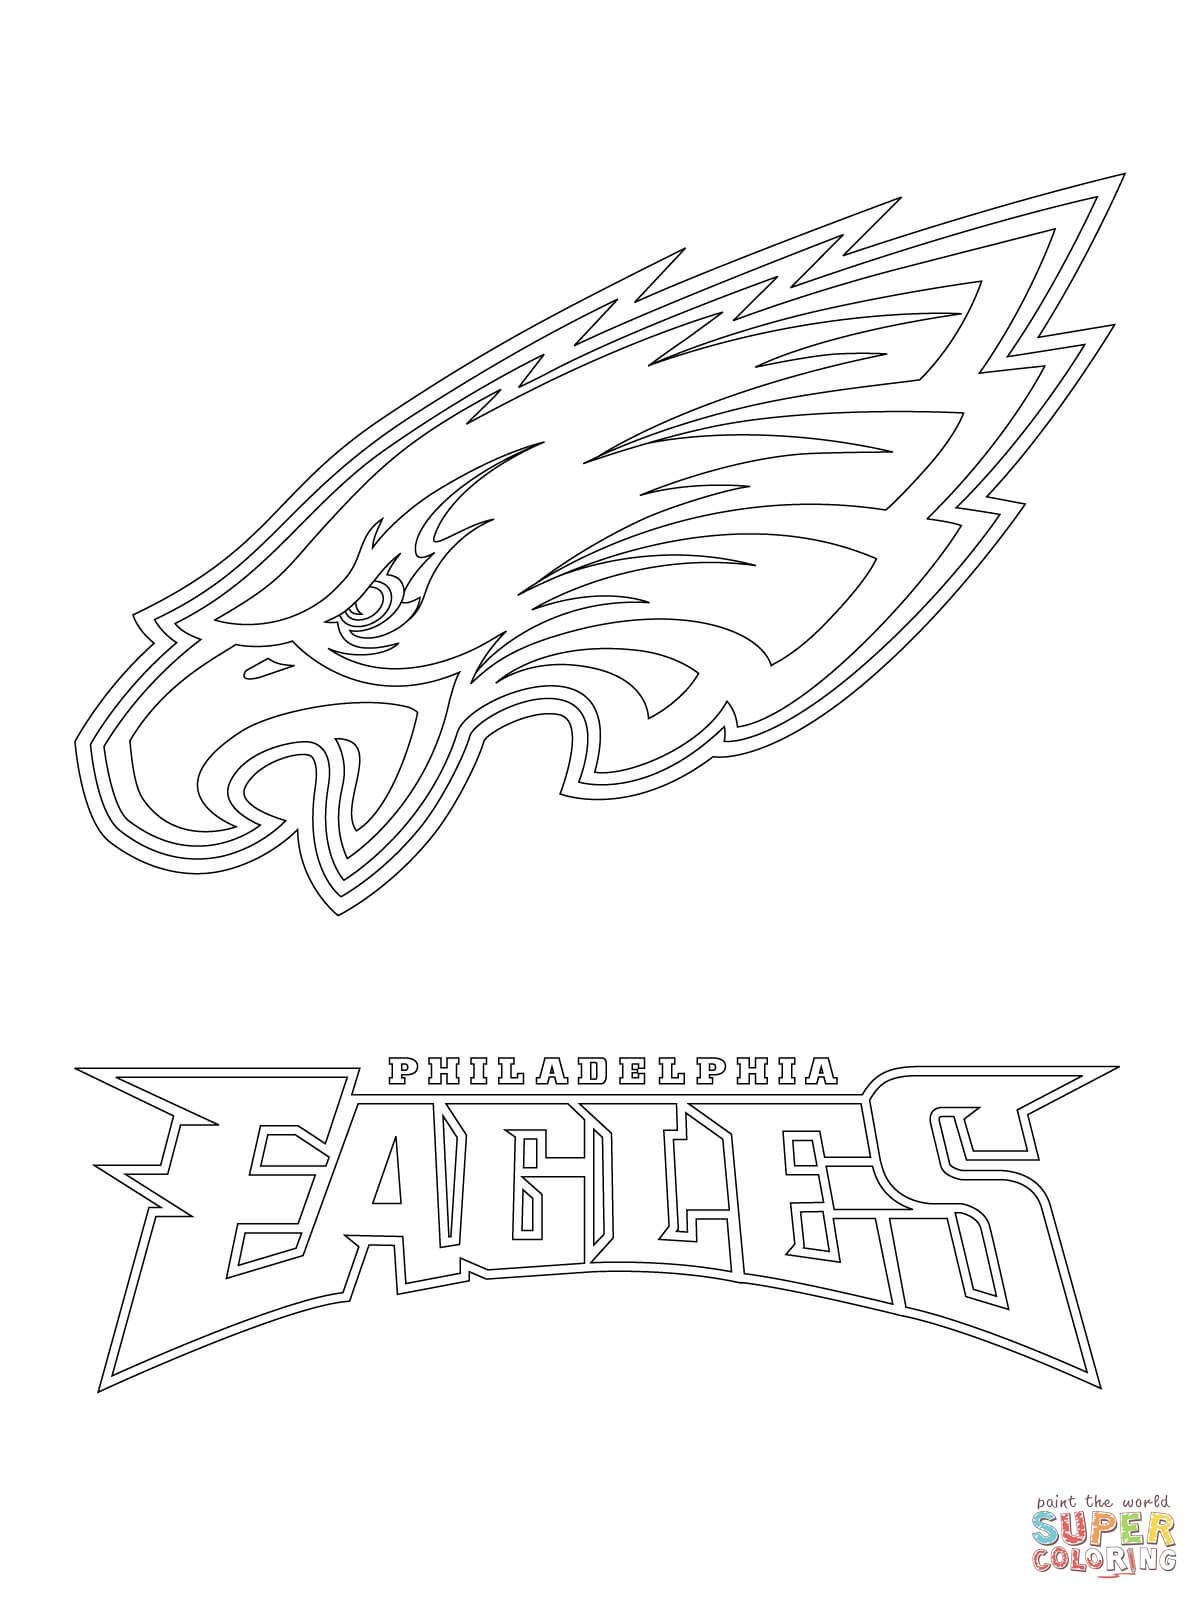 Philadelphia Eagles Logo | Super Coloring | E-A-G-L-E-S | Pinterest ...